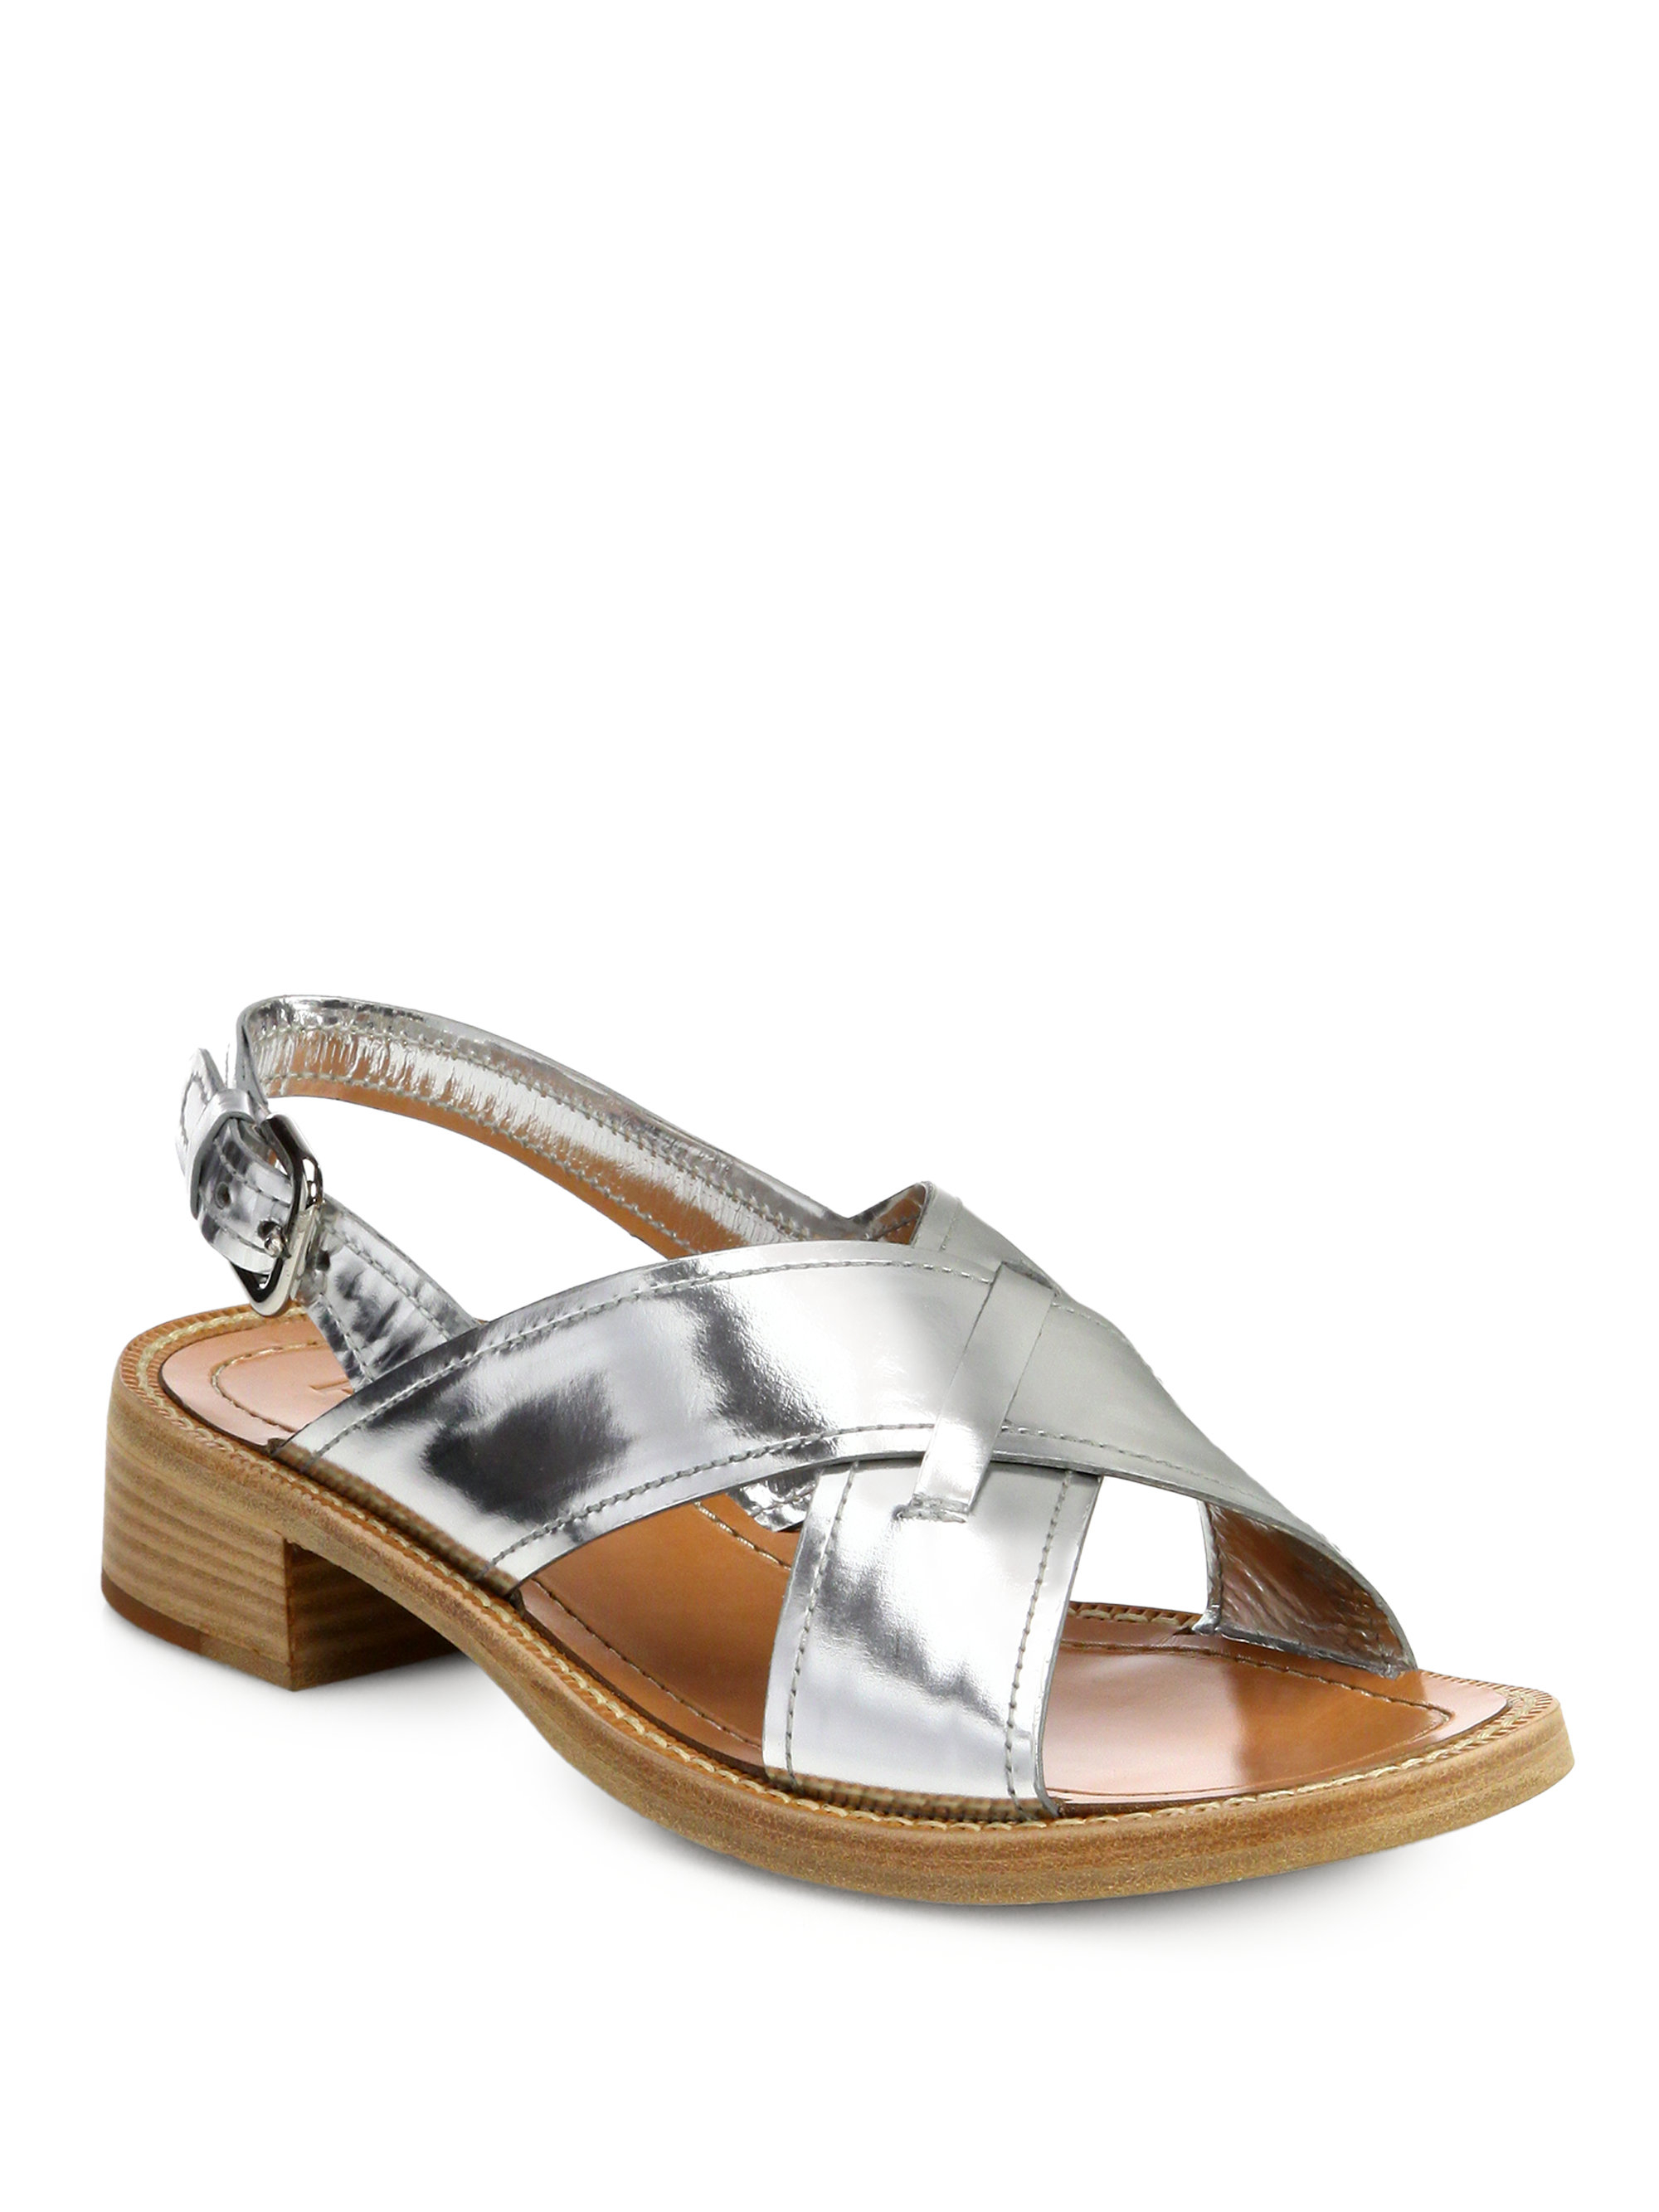 811116566a1 Lyst - Prada Metallic Leather Criss-Cross Sandals in Metallic